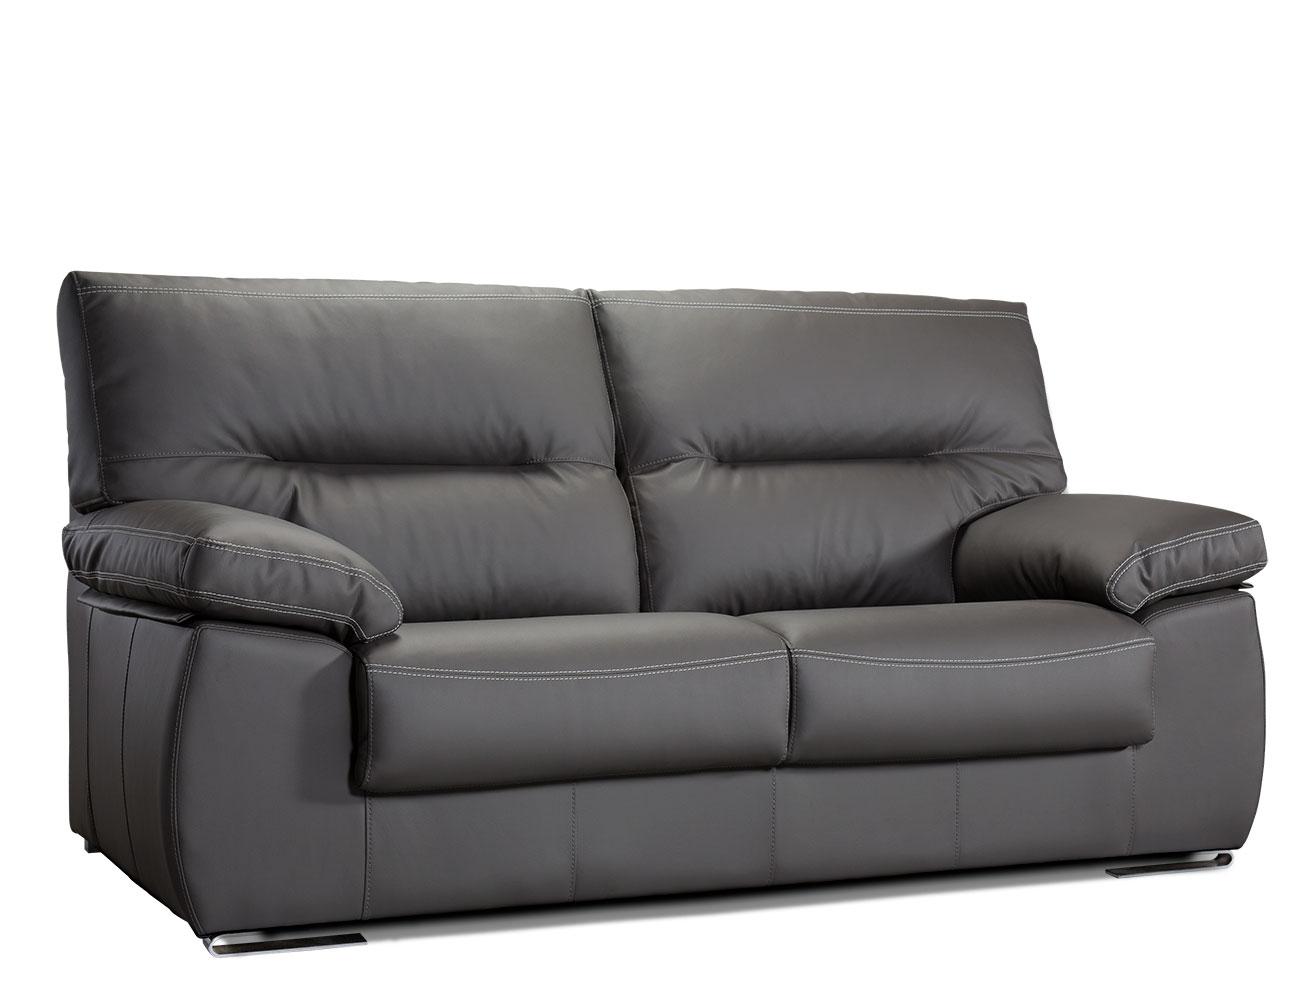 Sofa de 3 plazas tapizado en polipiel de alto confort for Reparar sofa polipiel